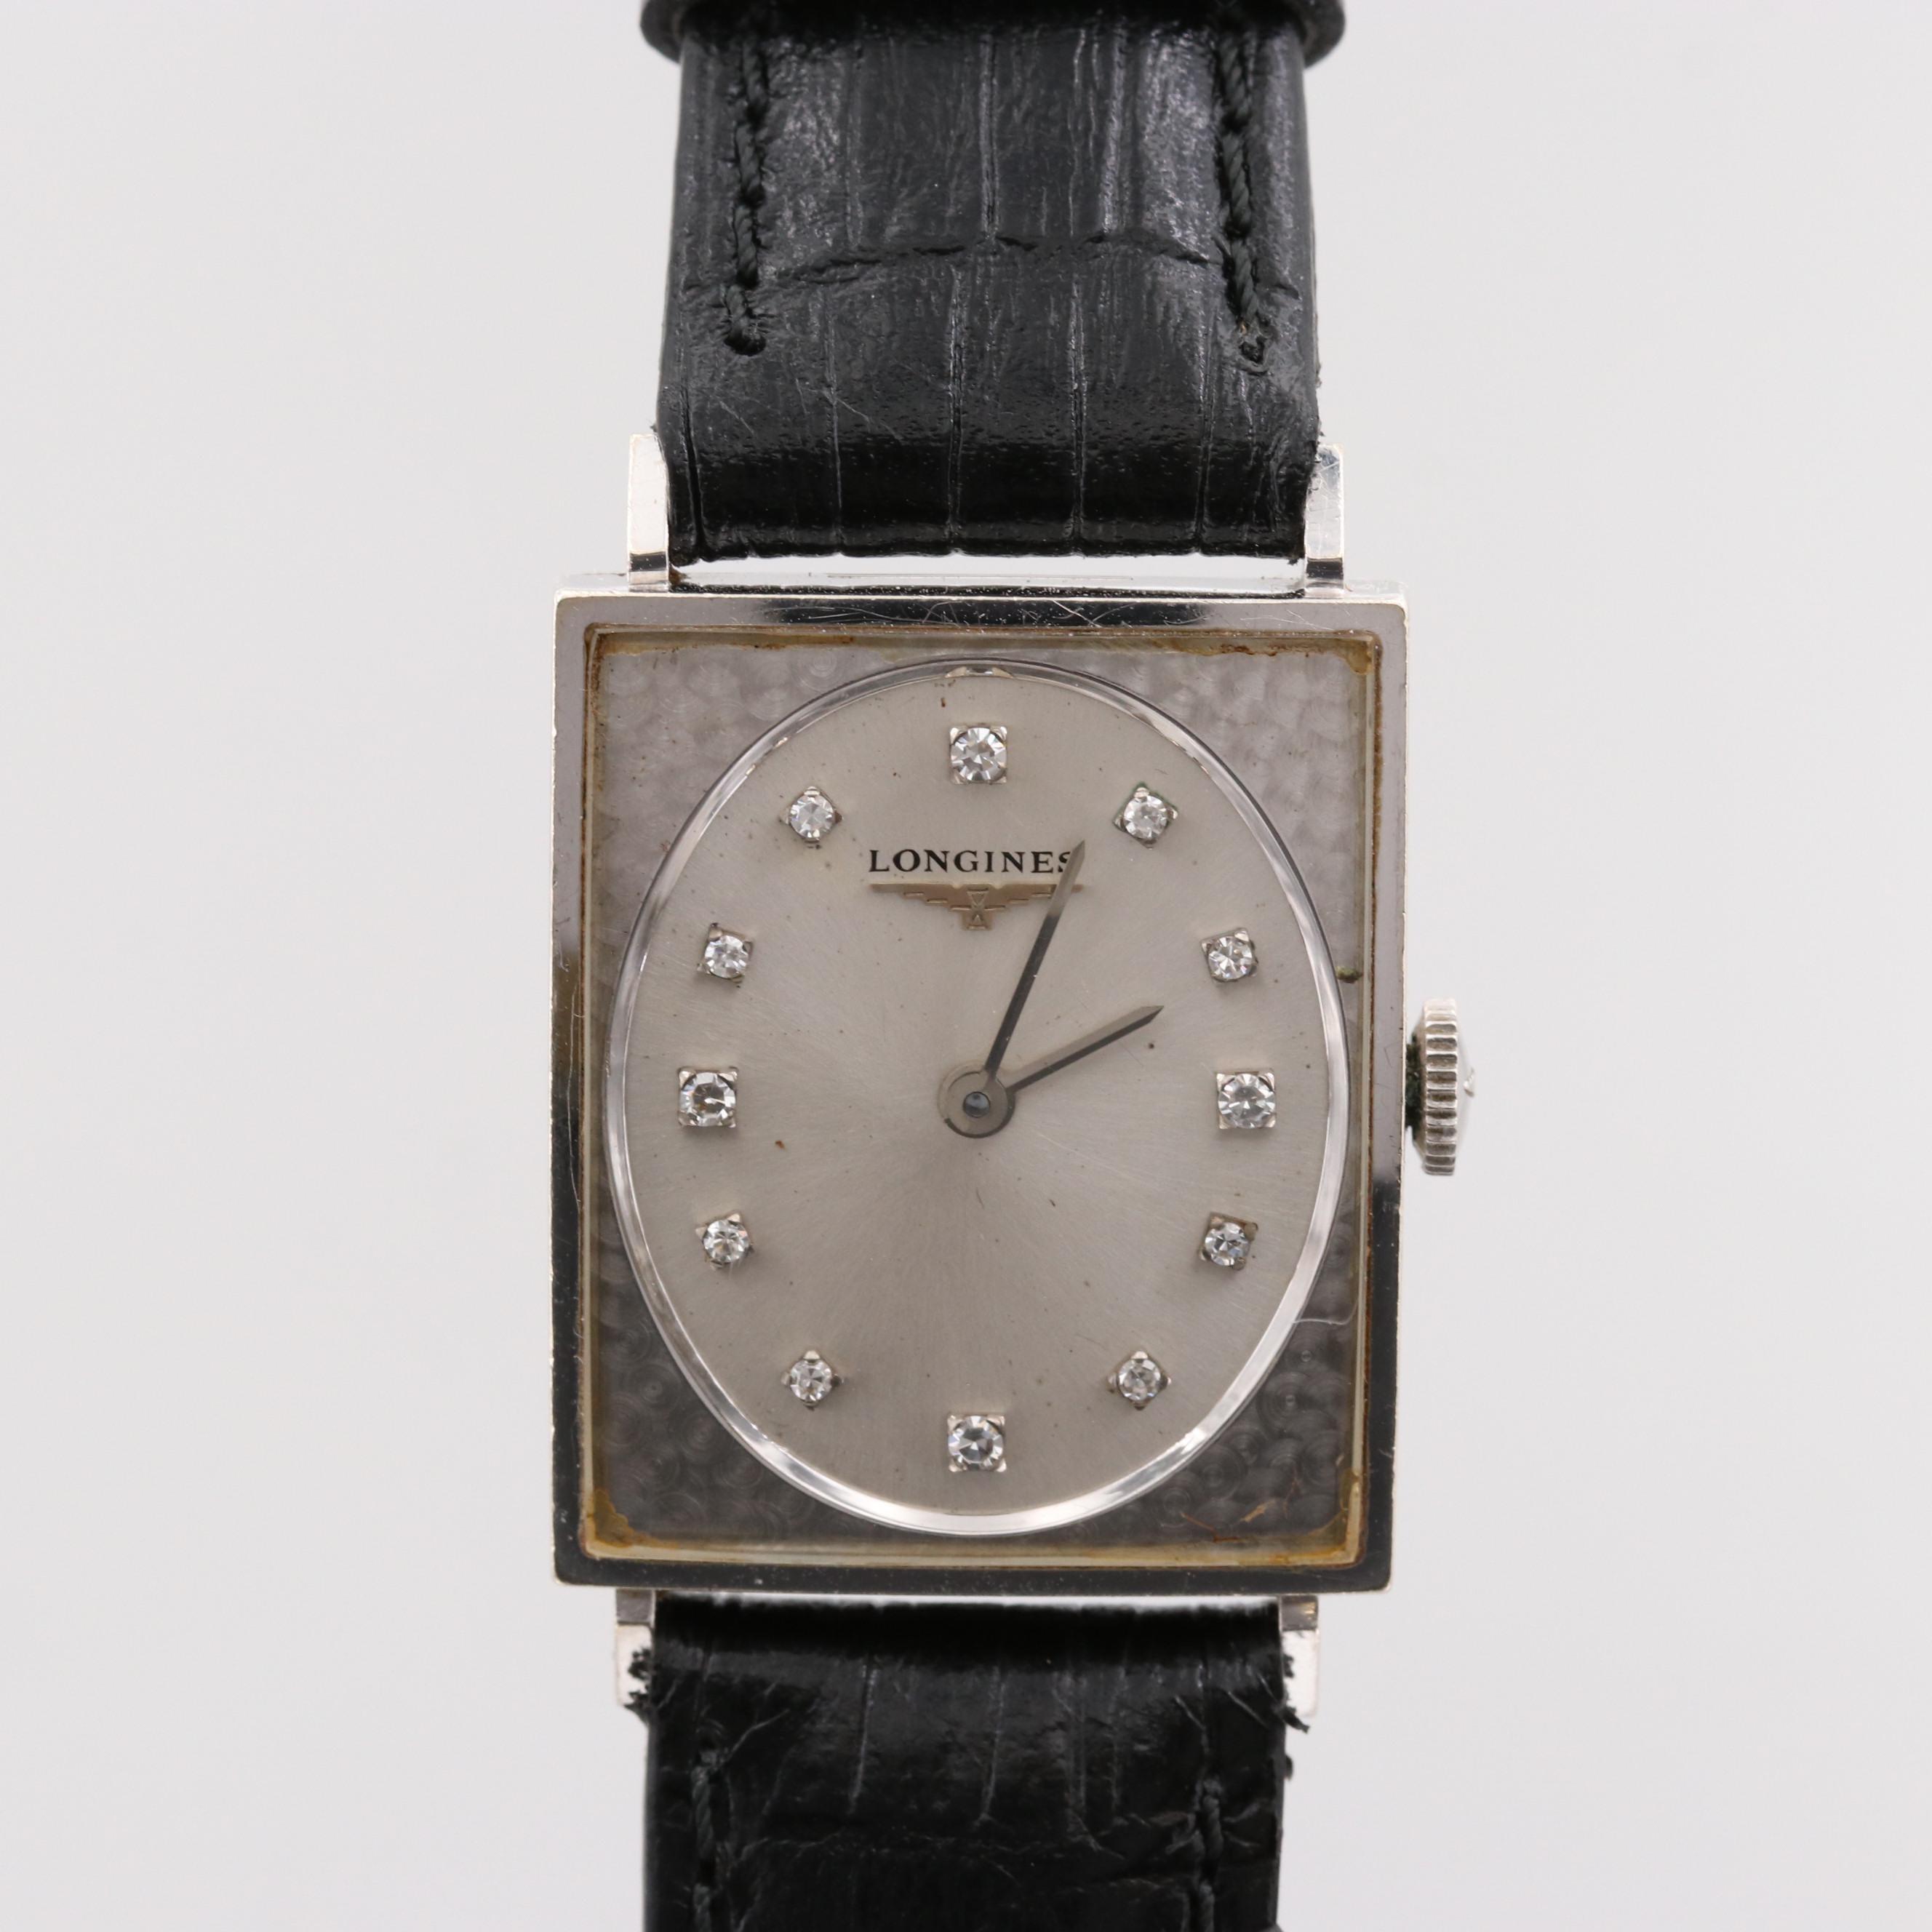 Longines 14K White Gold Wristwatch with Diamond Dial